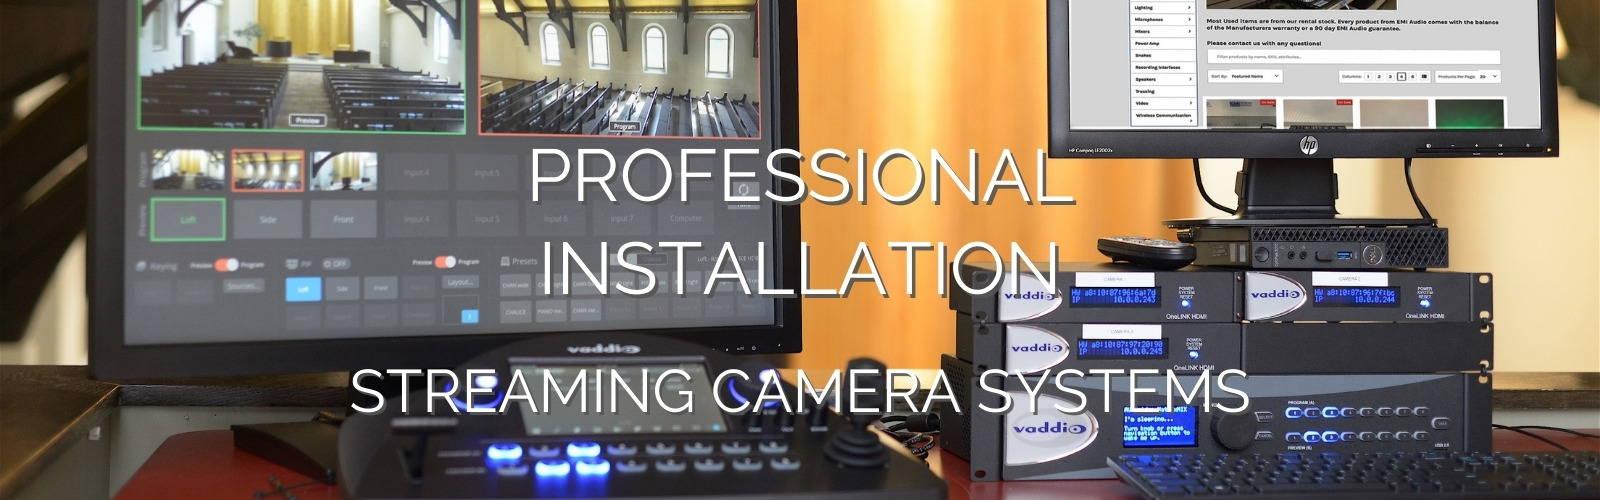 Professional installation of cameras sound systems emi audio